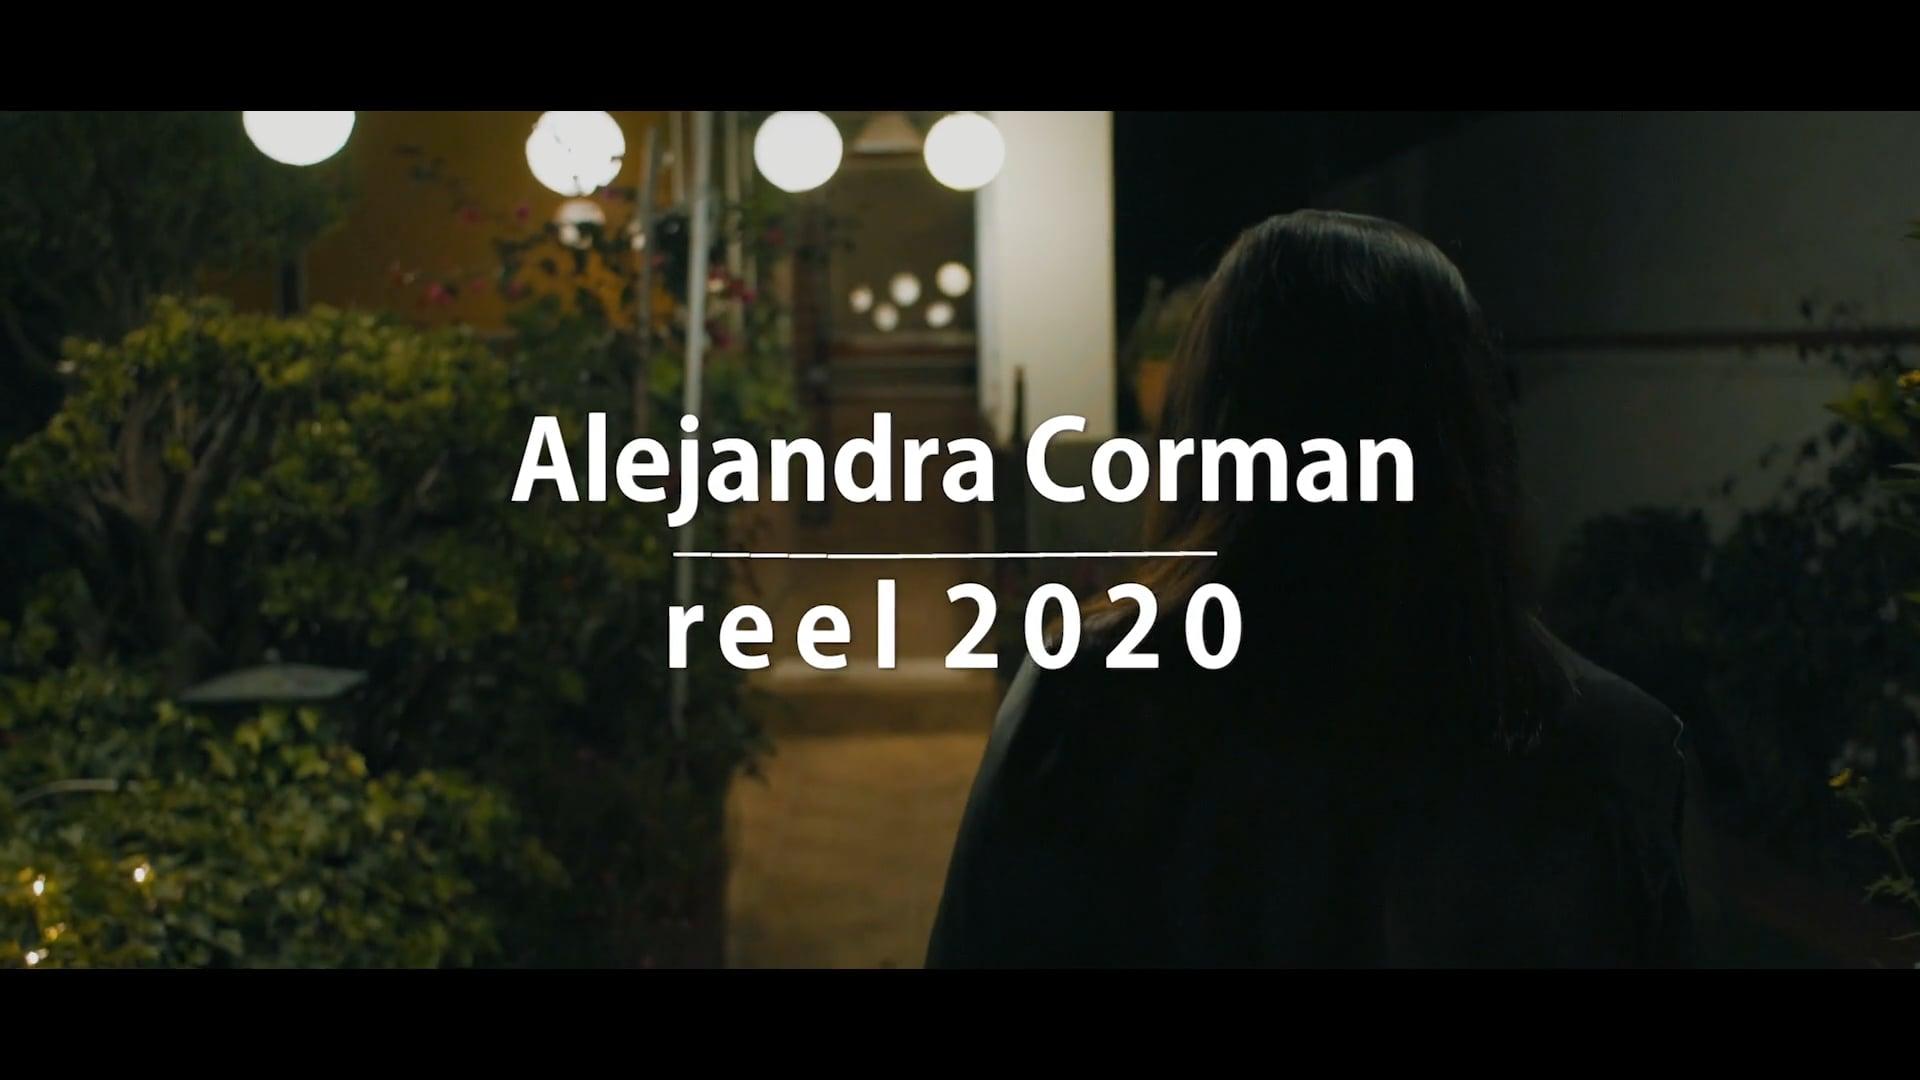 Alejandra Corman Reel 2020